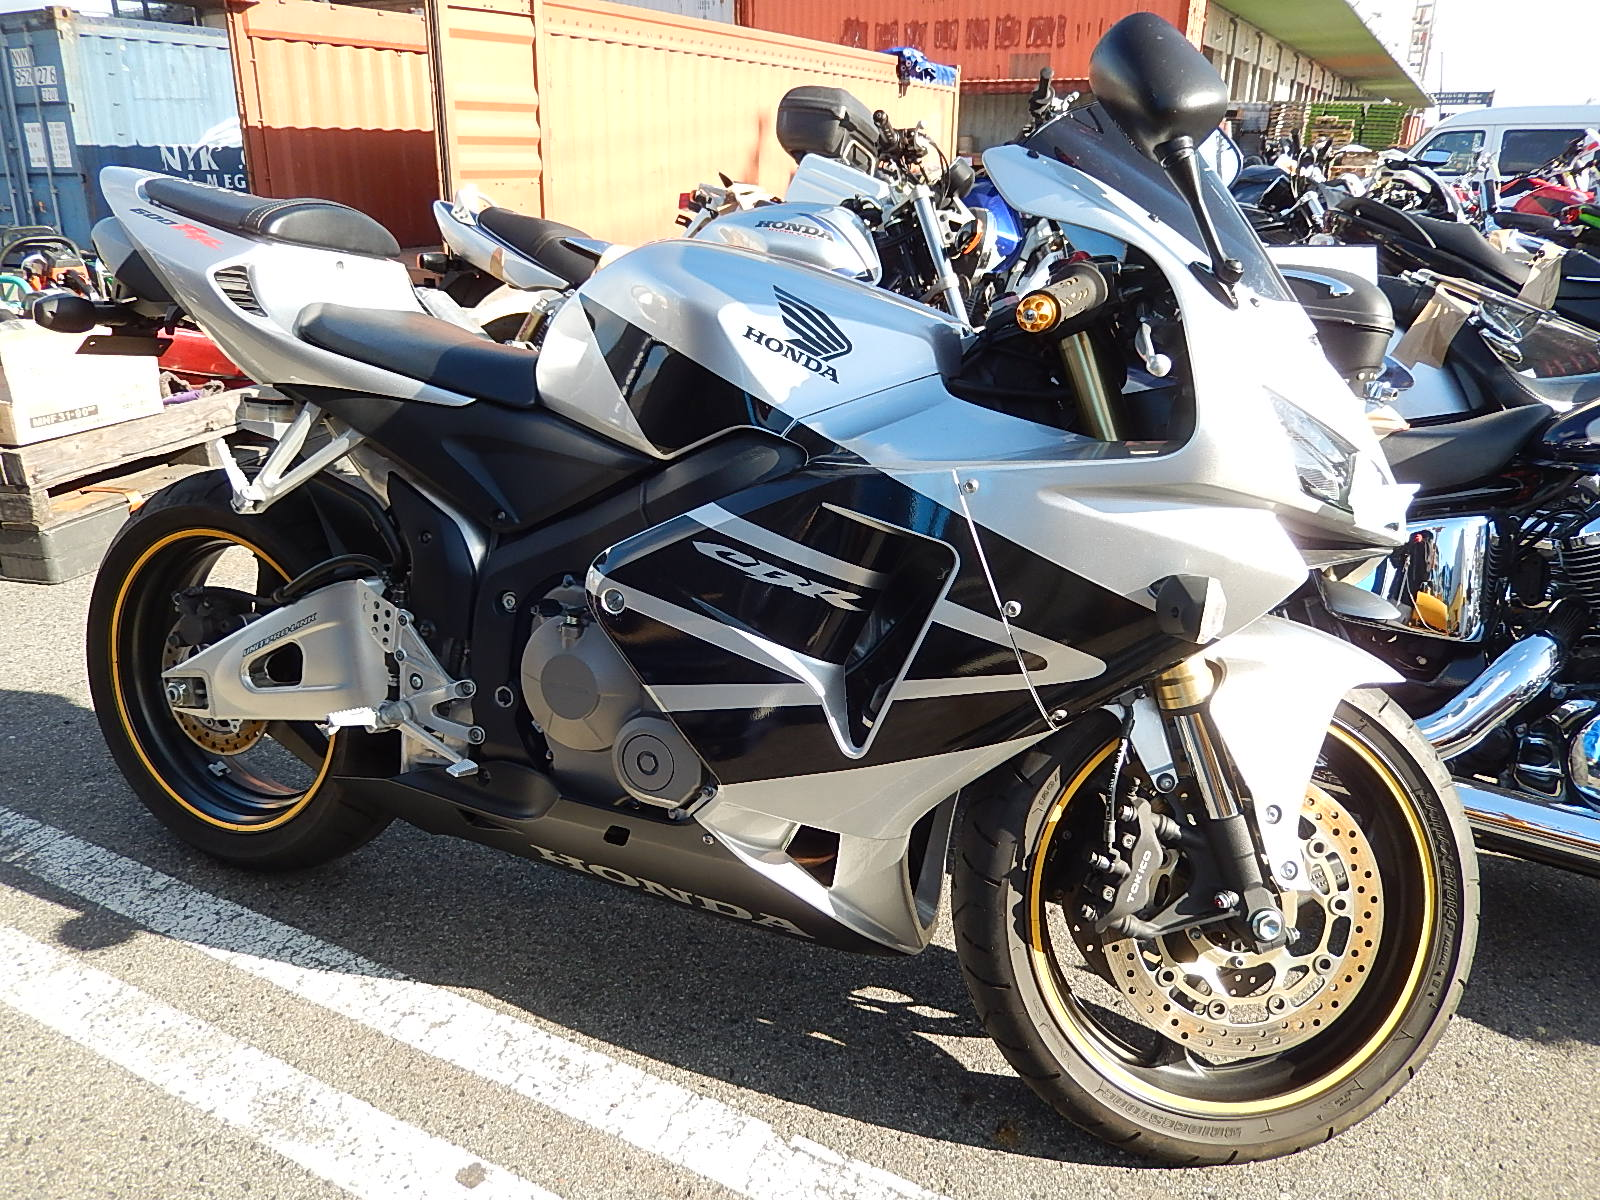 Honda Cbr600rr Honda Motocikl Kupit V Avtobest Moto